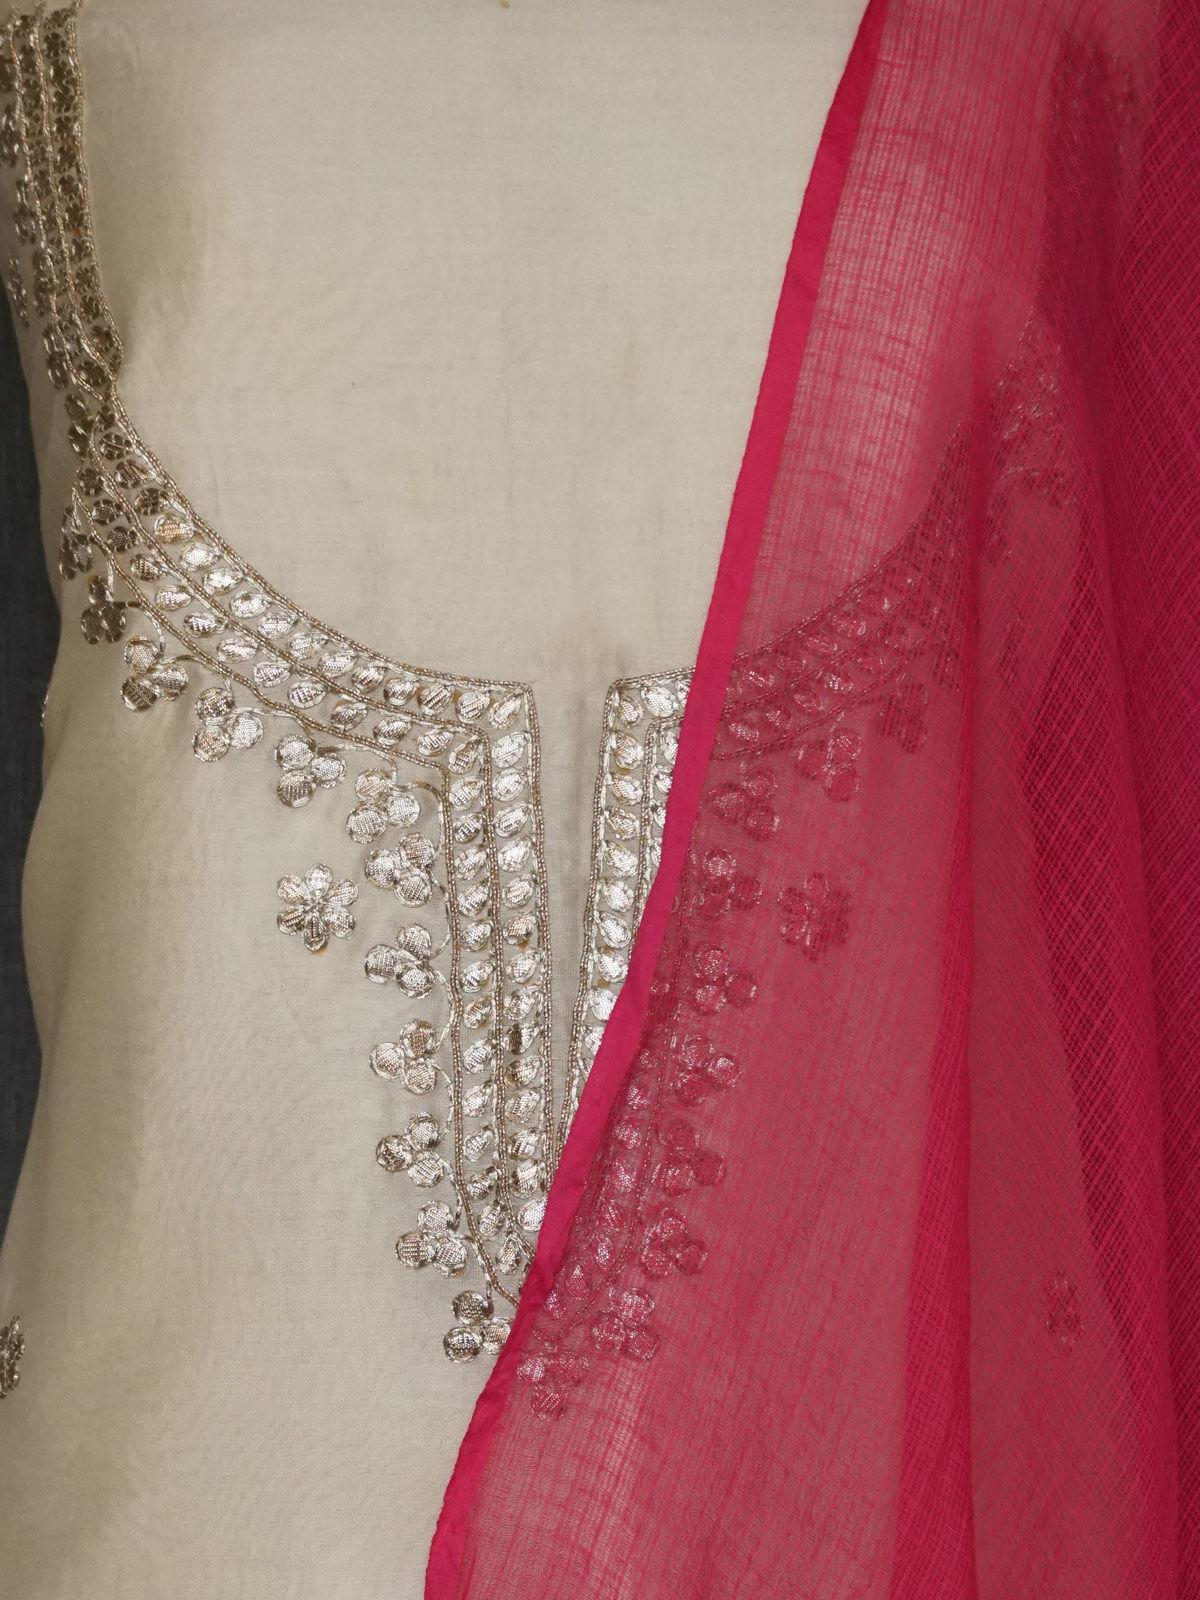 off white  chanderi dress material with gota patti work and red kota cotton dupatta